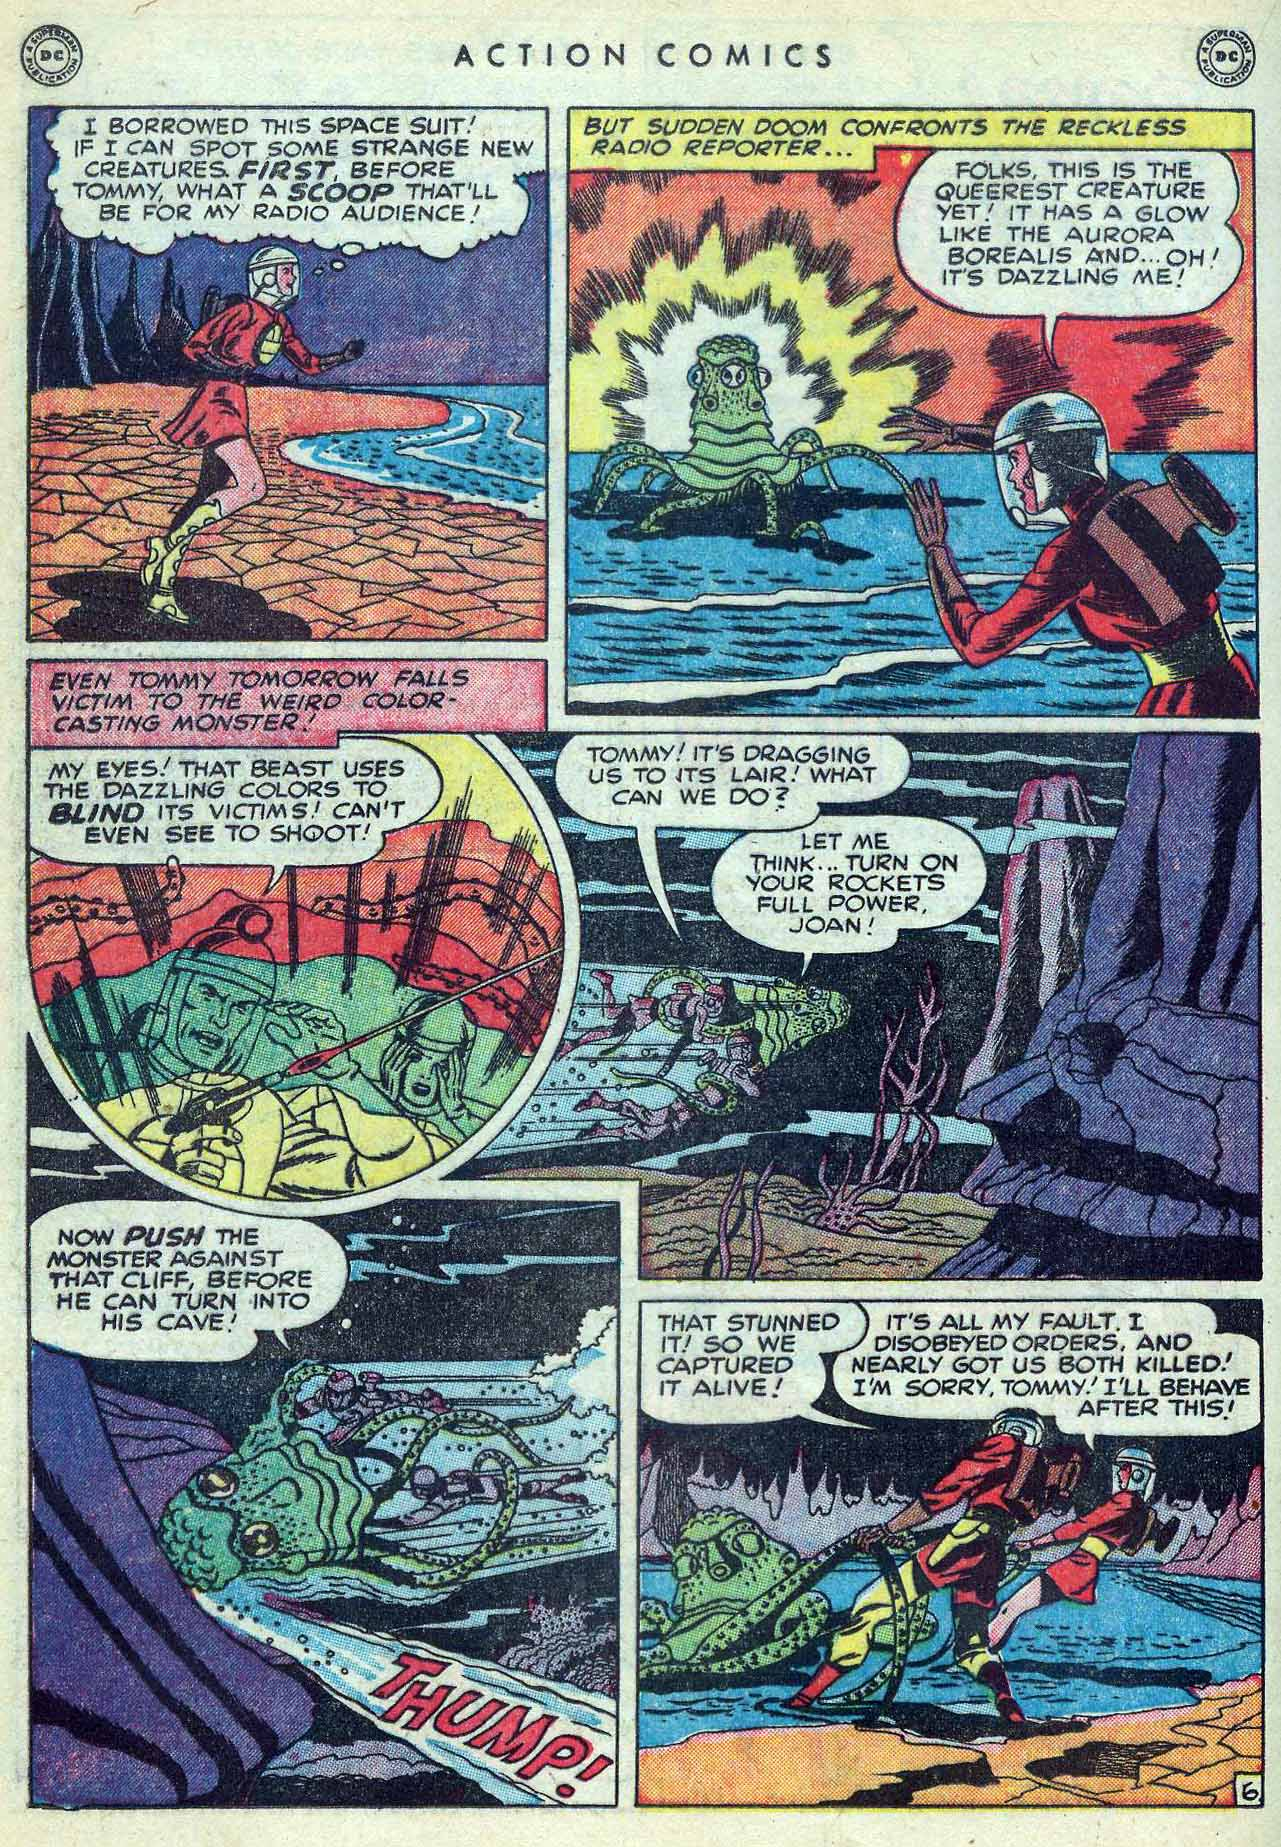 Action Comics (1938) 127 Page 27